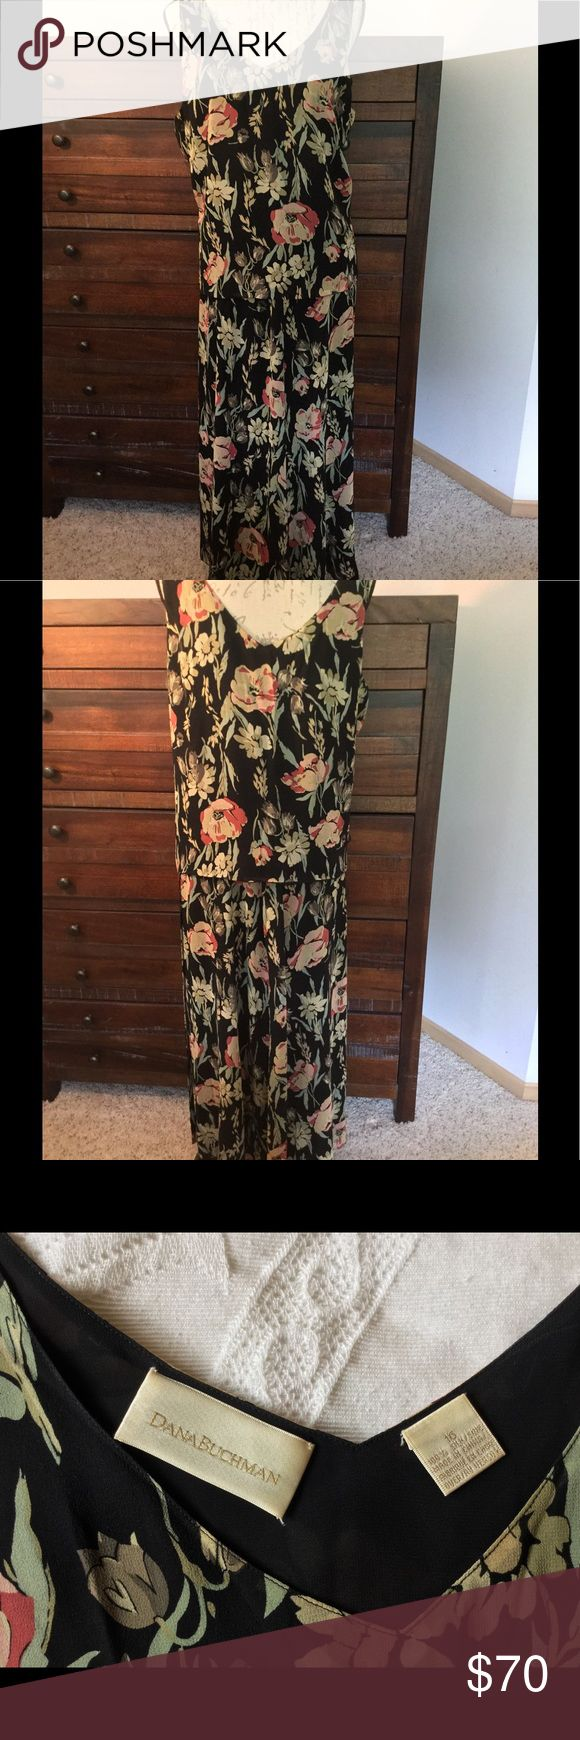 "Dana Buchman two piece dress Dana Buchman two piece dress.  38"" size 10 skirt with matching size 16 tank.  Black with muted green, beige, pink floral pattern.  100% Silk.  Great for summer weddings! Dana Buchman Dresses"